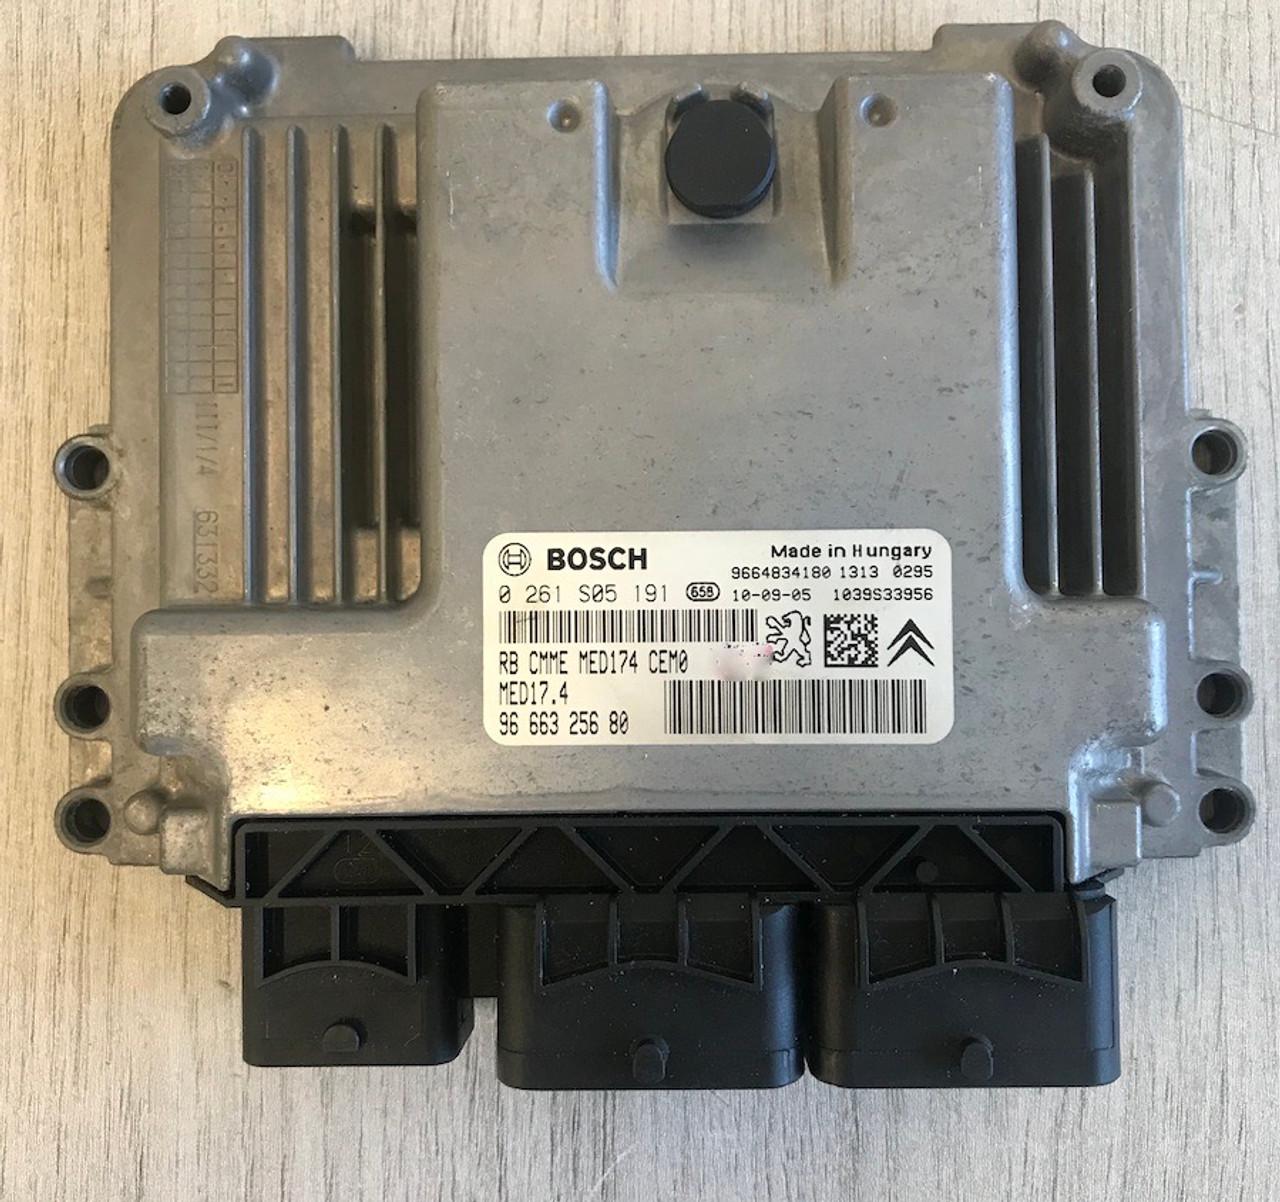 Bosch Engine ECU, Citroen DS3, 0261S05191, 0 261 S05 191, 9666325680, 96 663 256 80, 1039S33956, MED17.4